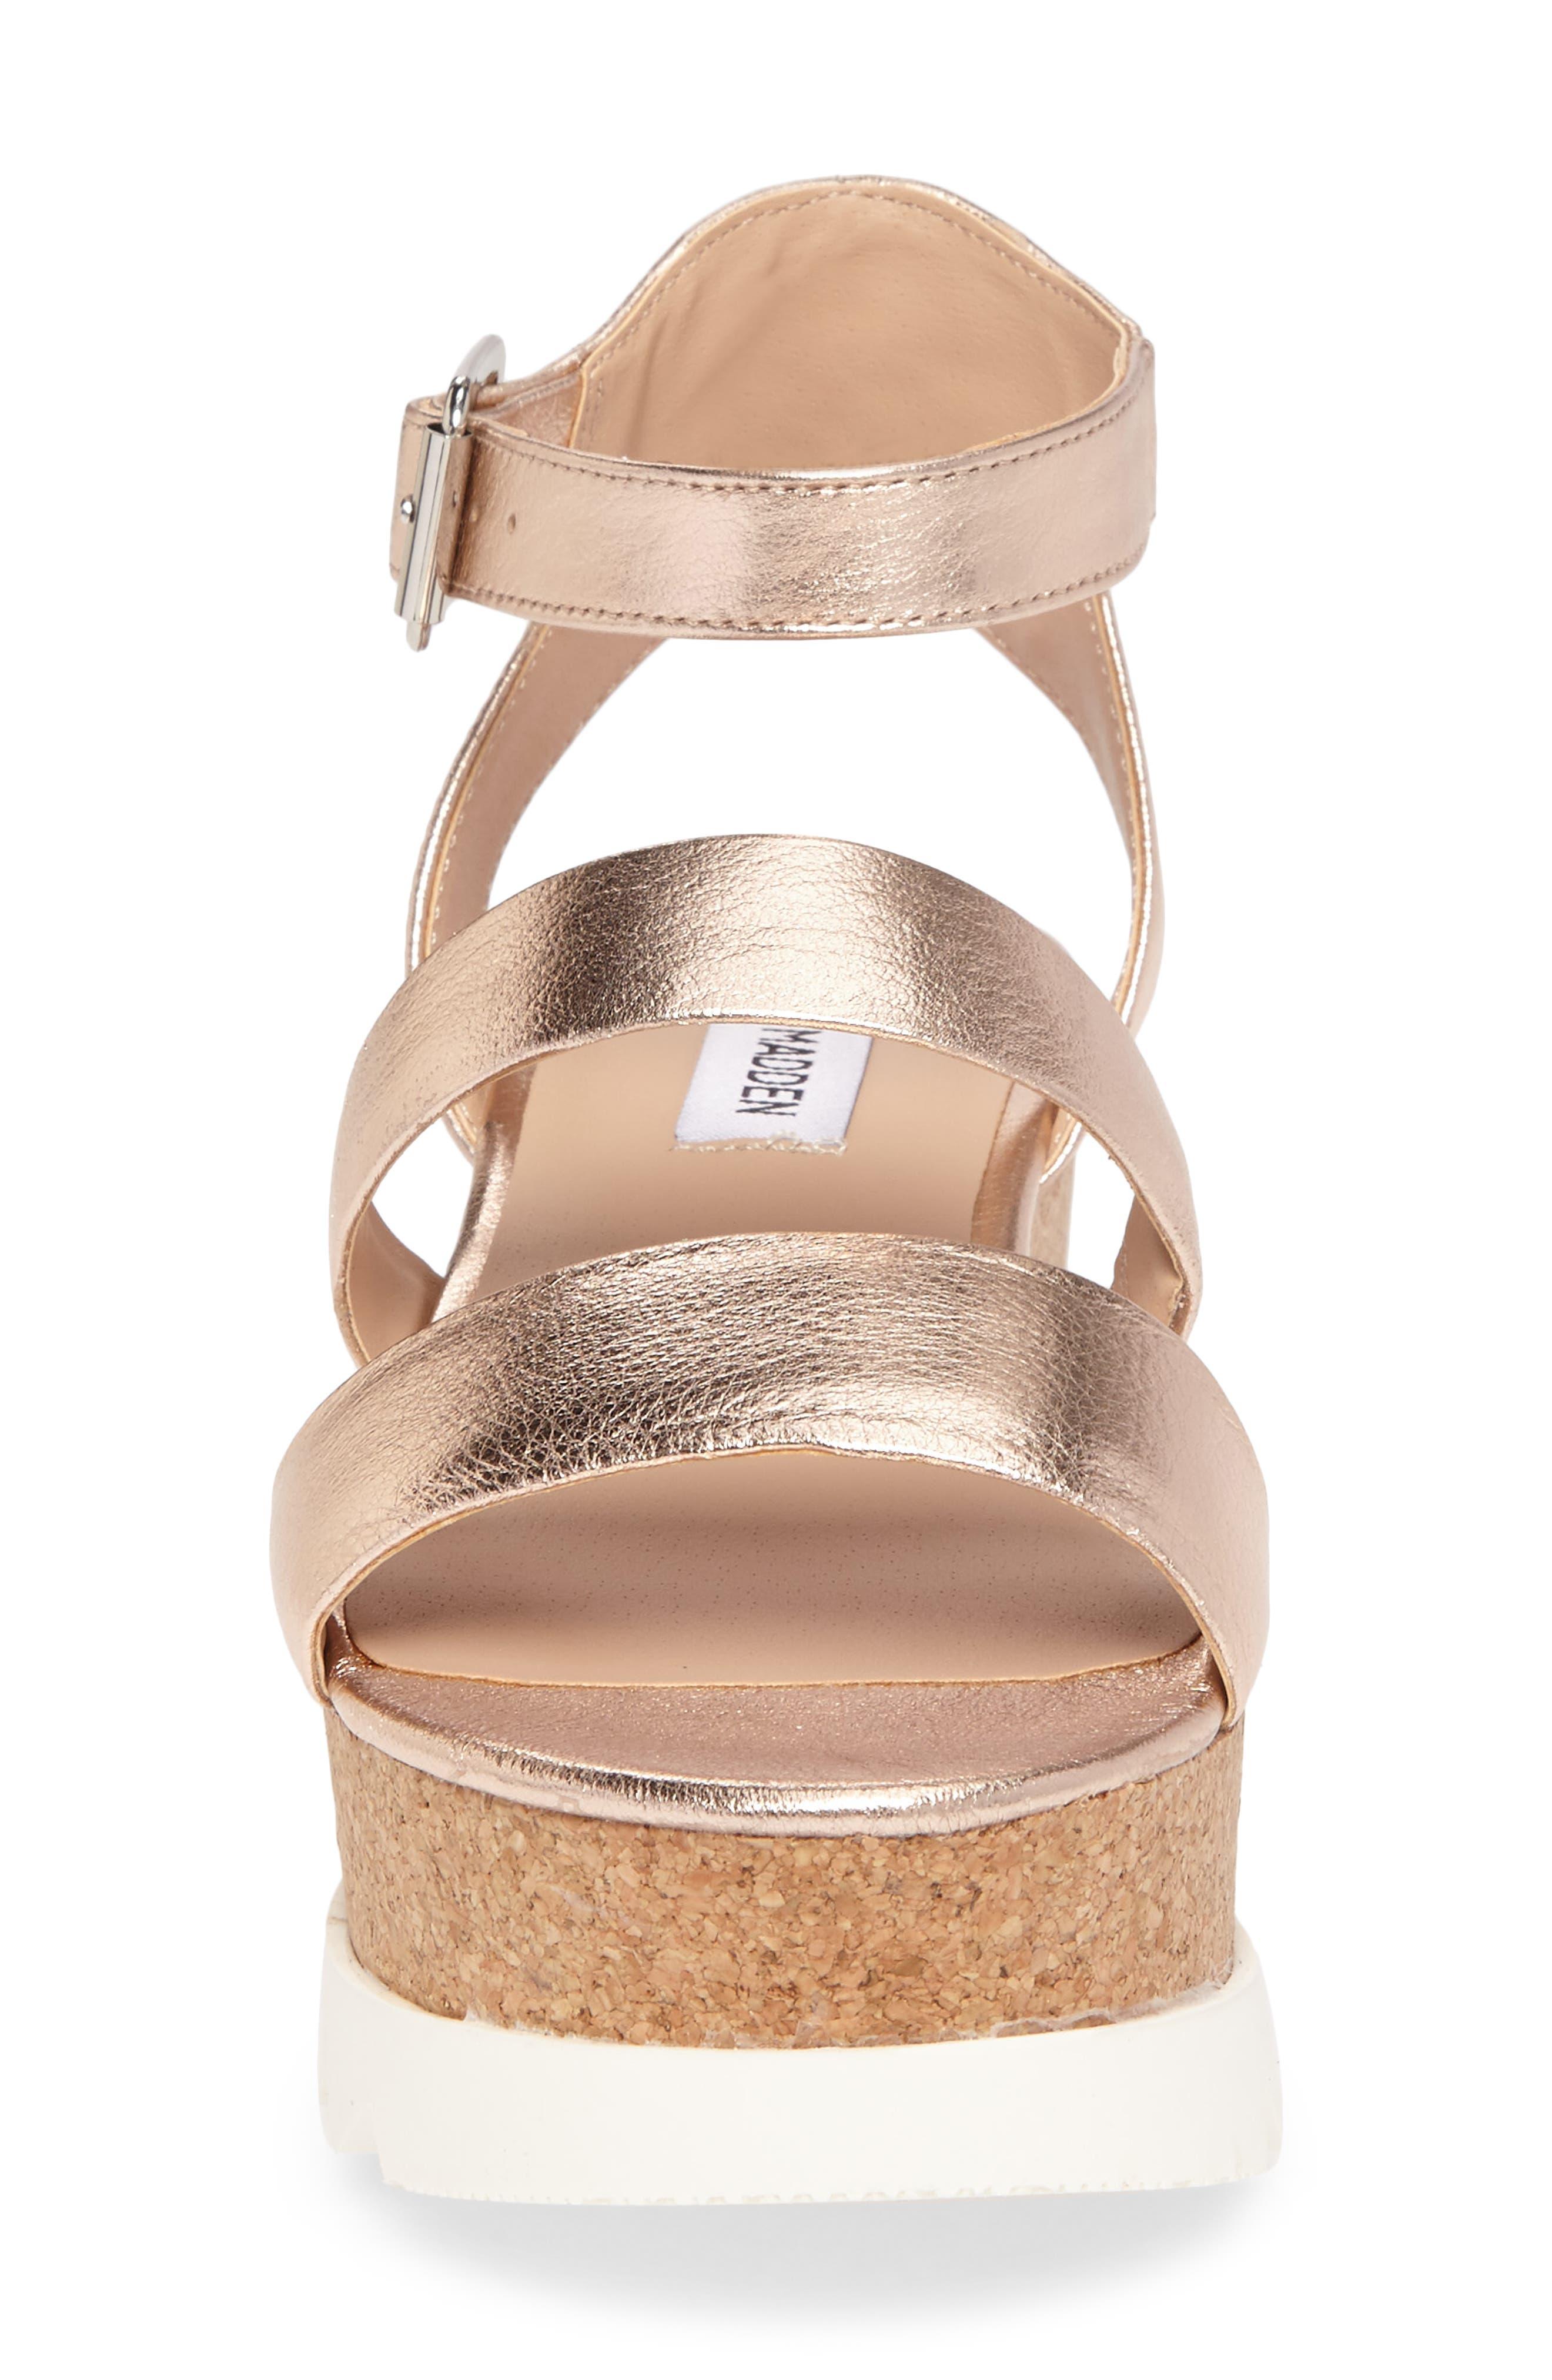 Kirsten Layered Platform Sandal,                             Alternate thumbnail 4, color,                             Rose Leather